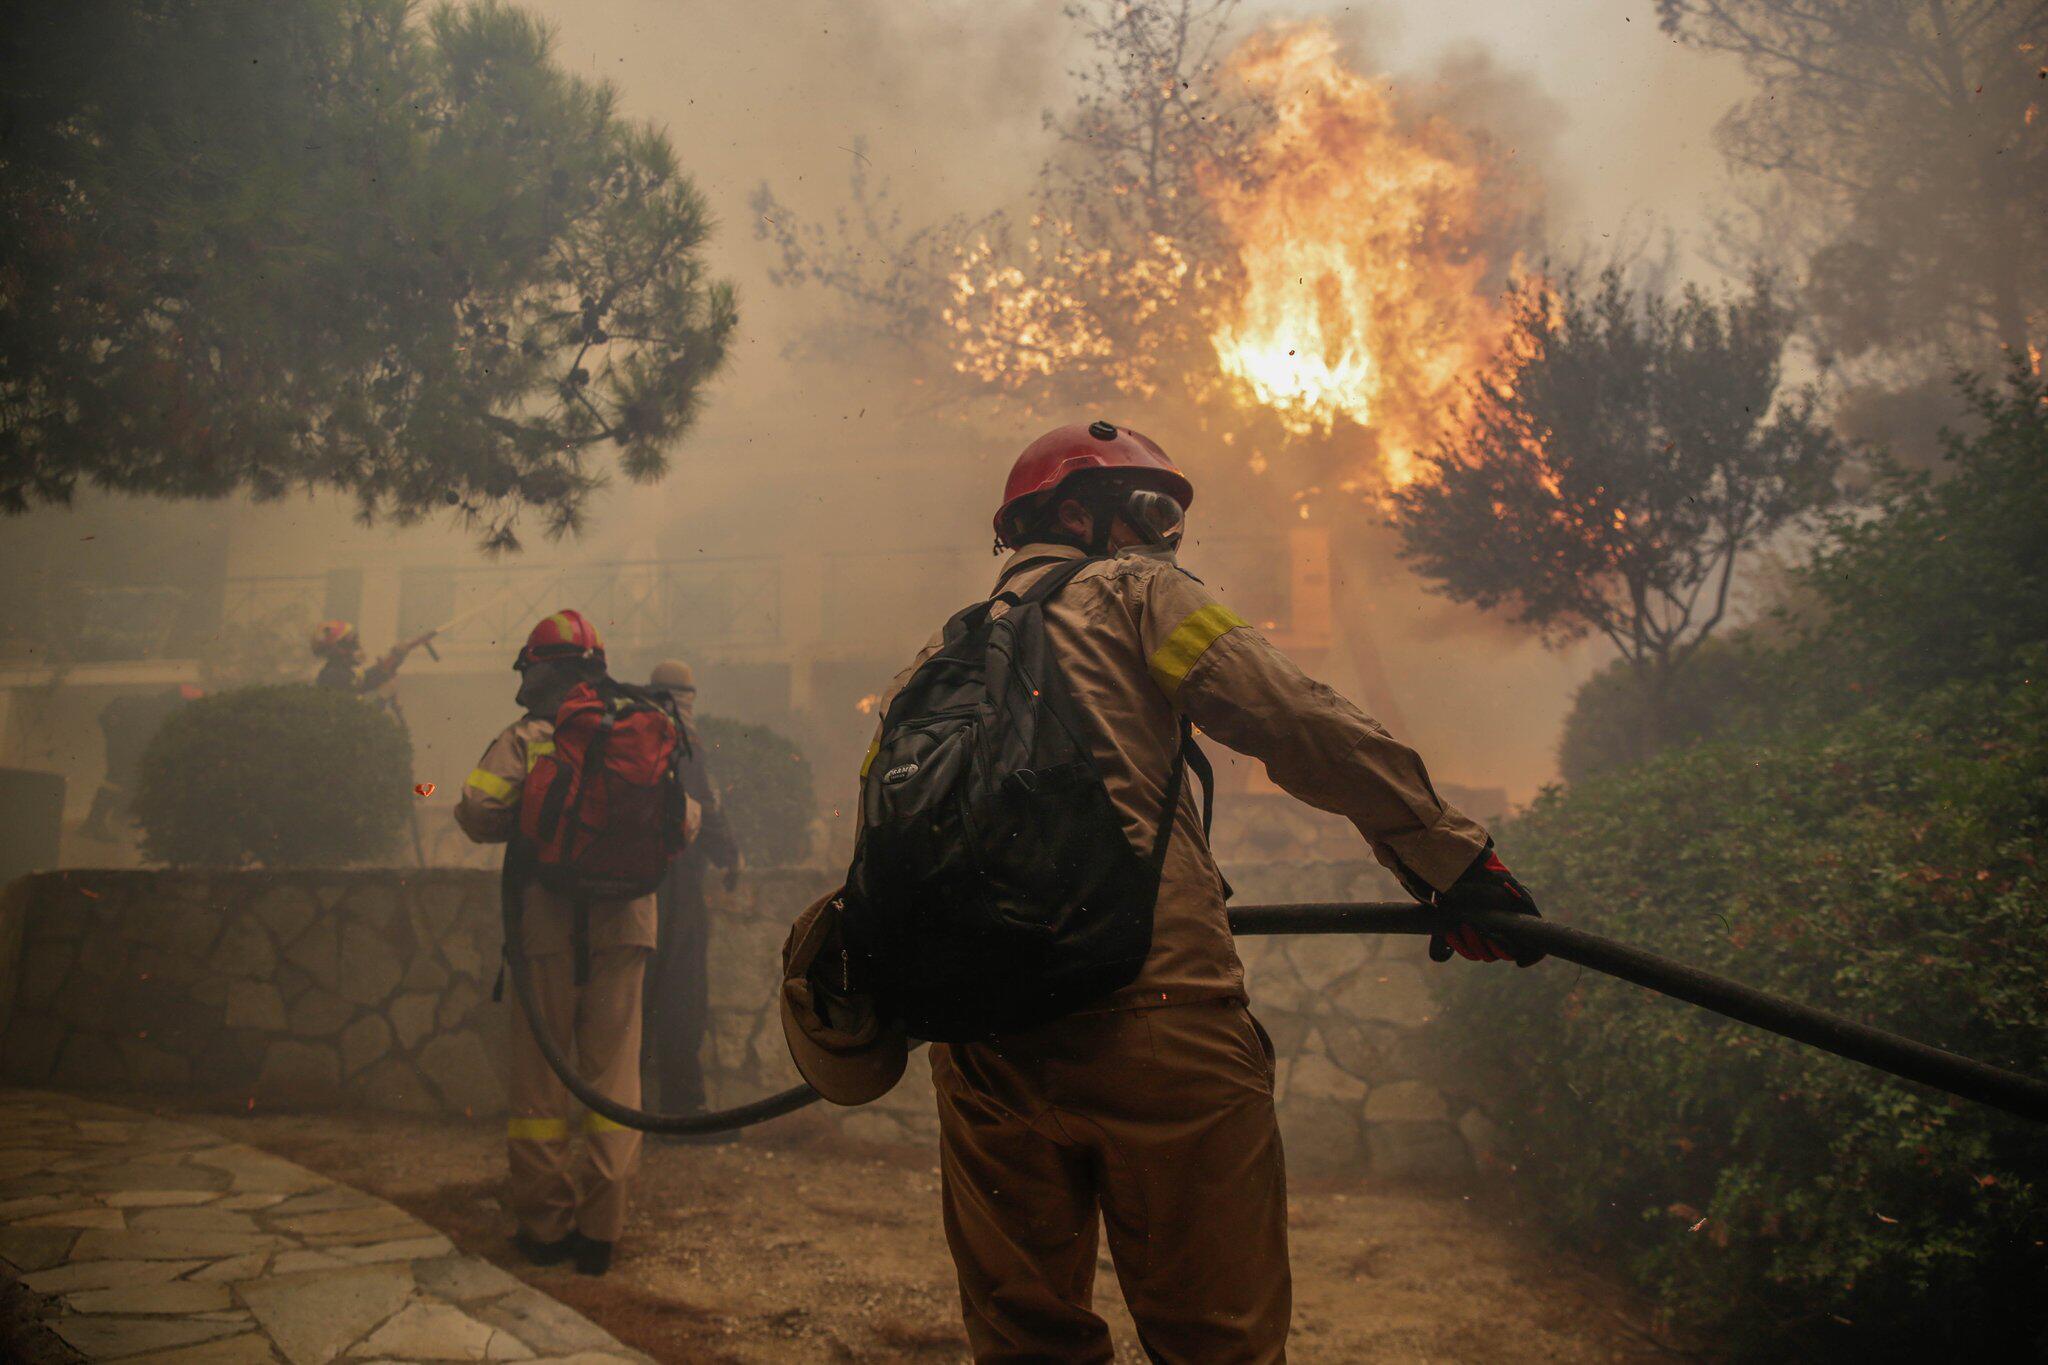 Bild zu Grossbrand in Griechenland